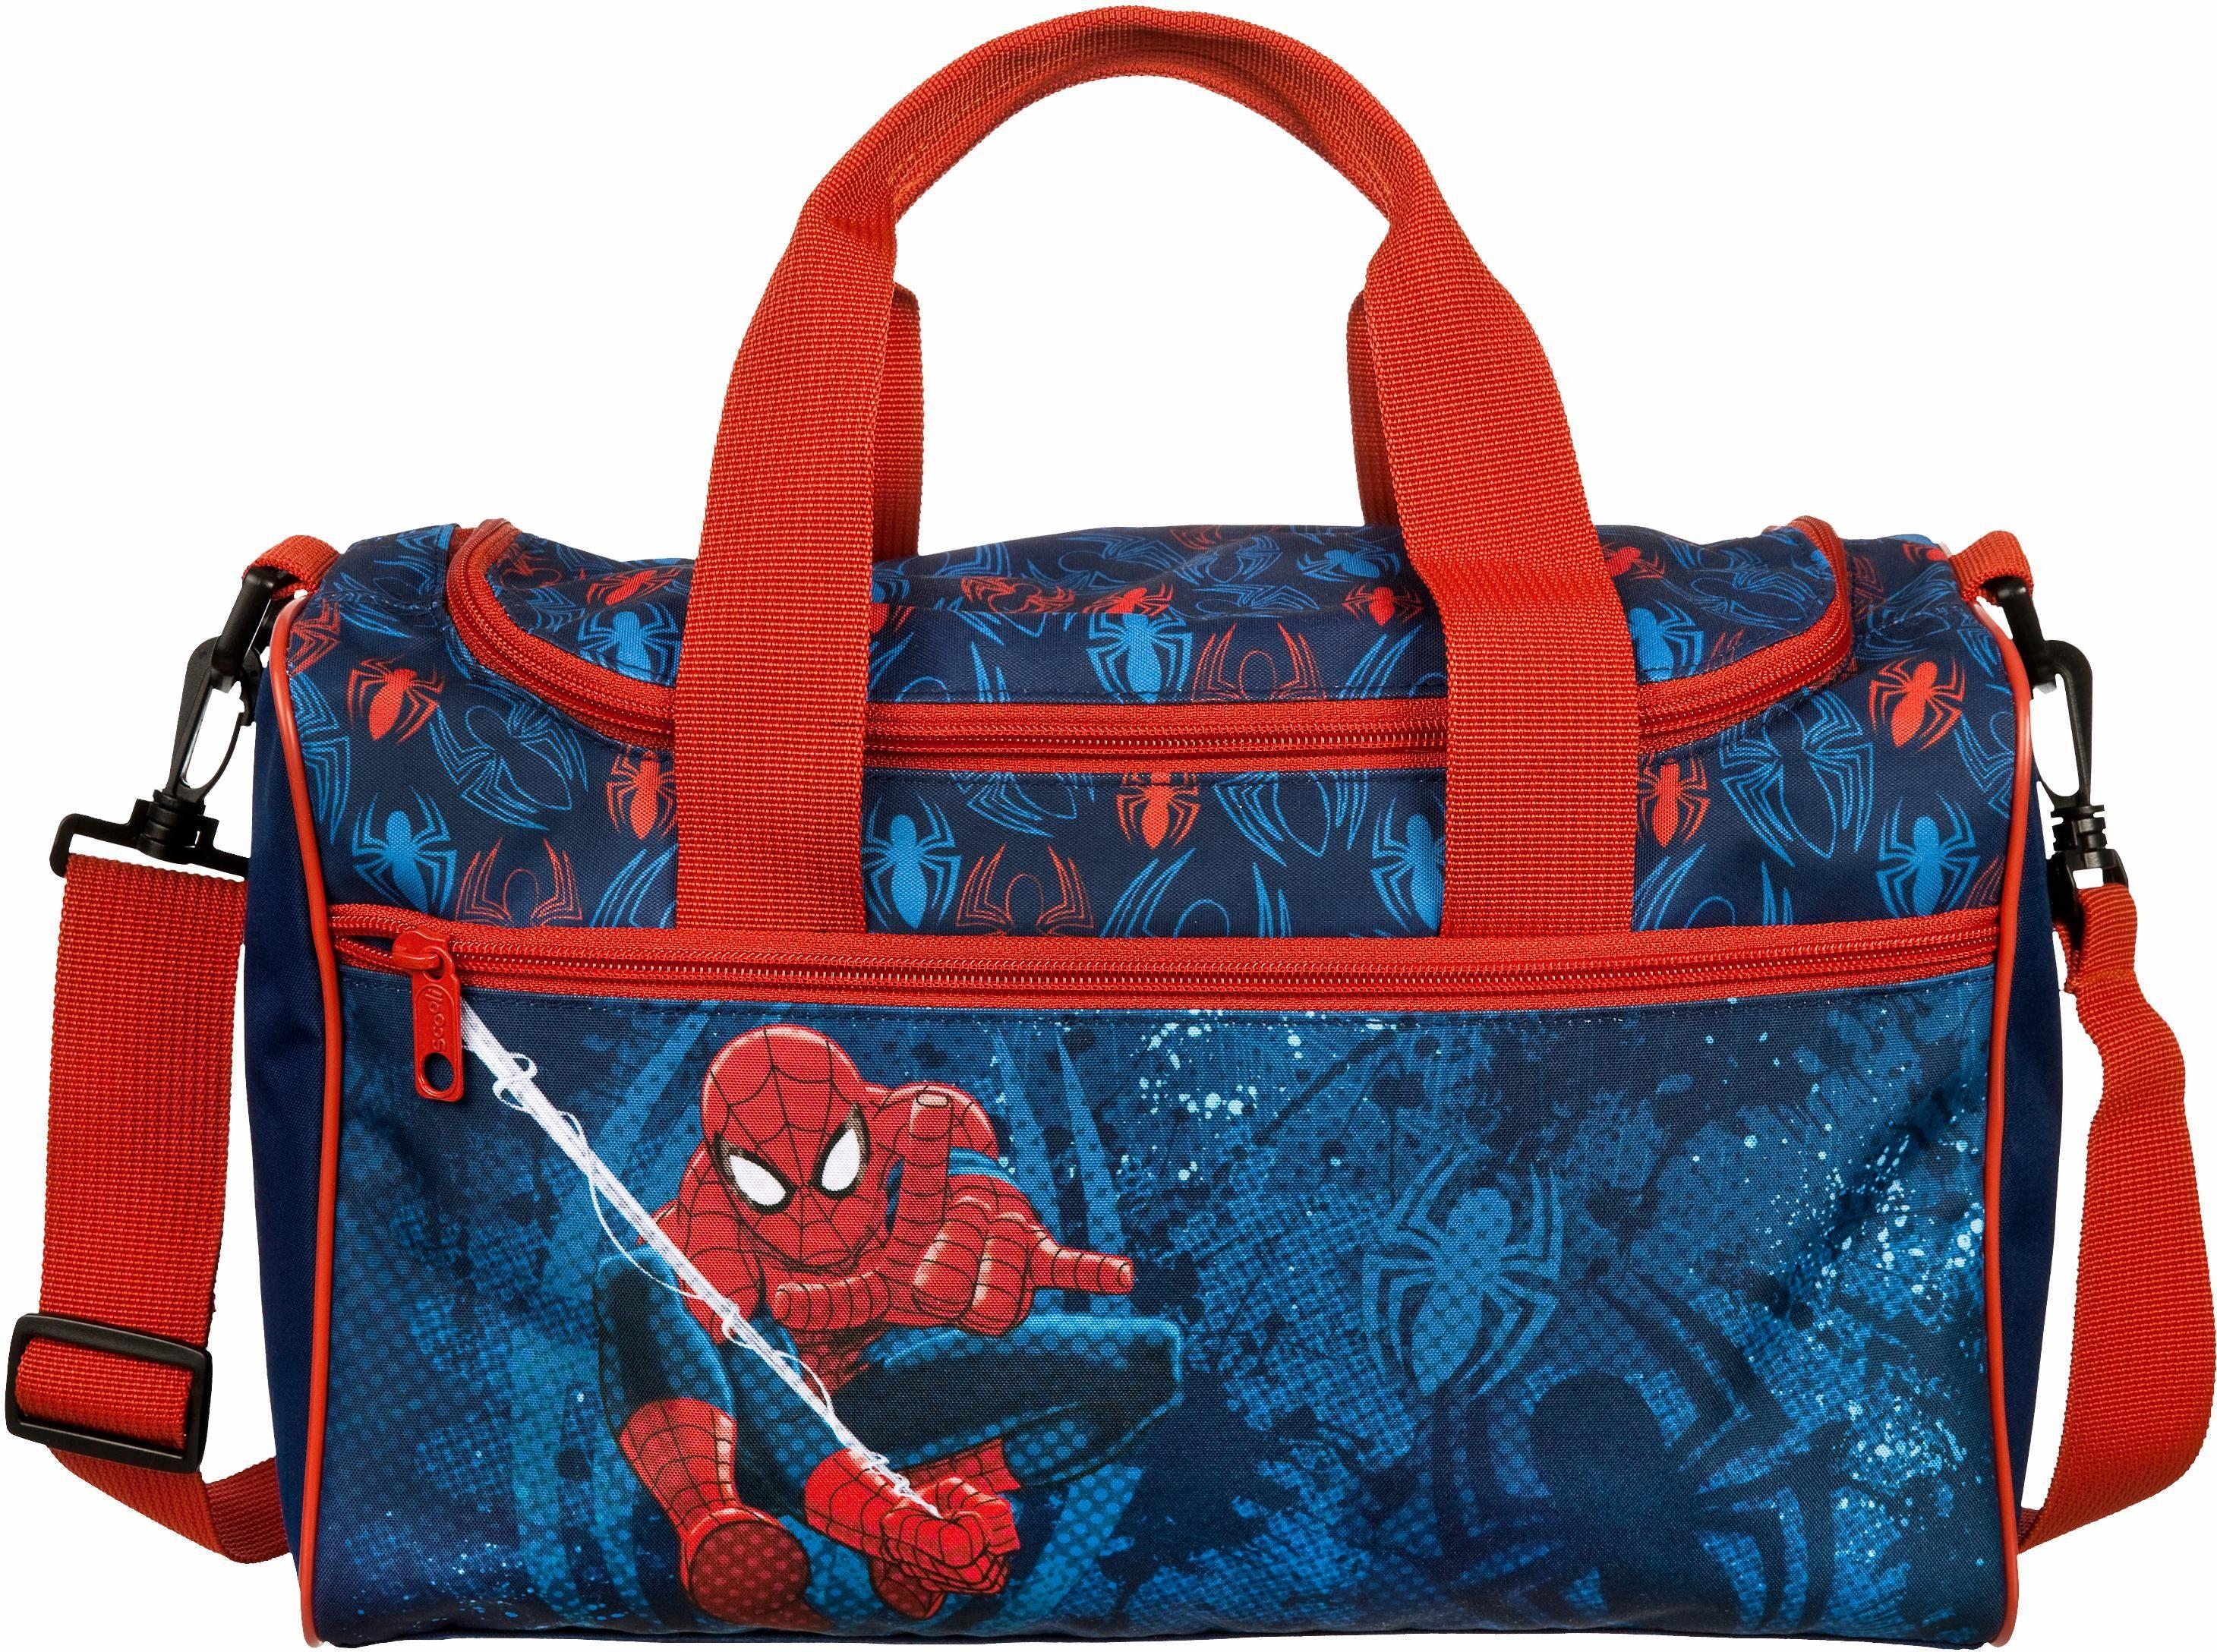 Scooli Sporttasche, »Spiderman«